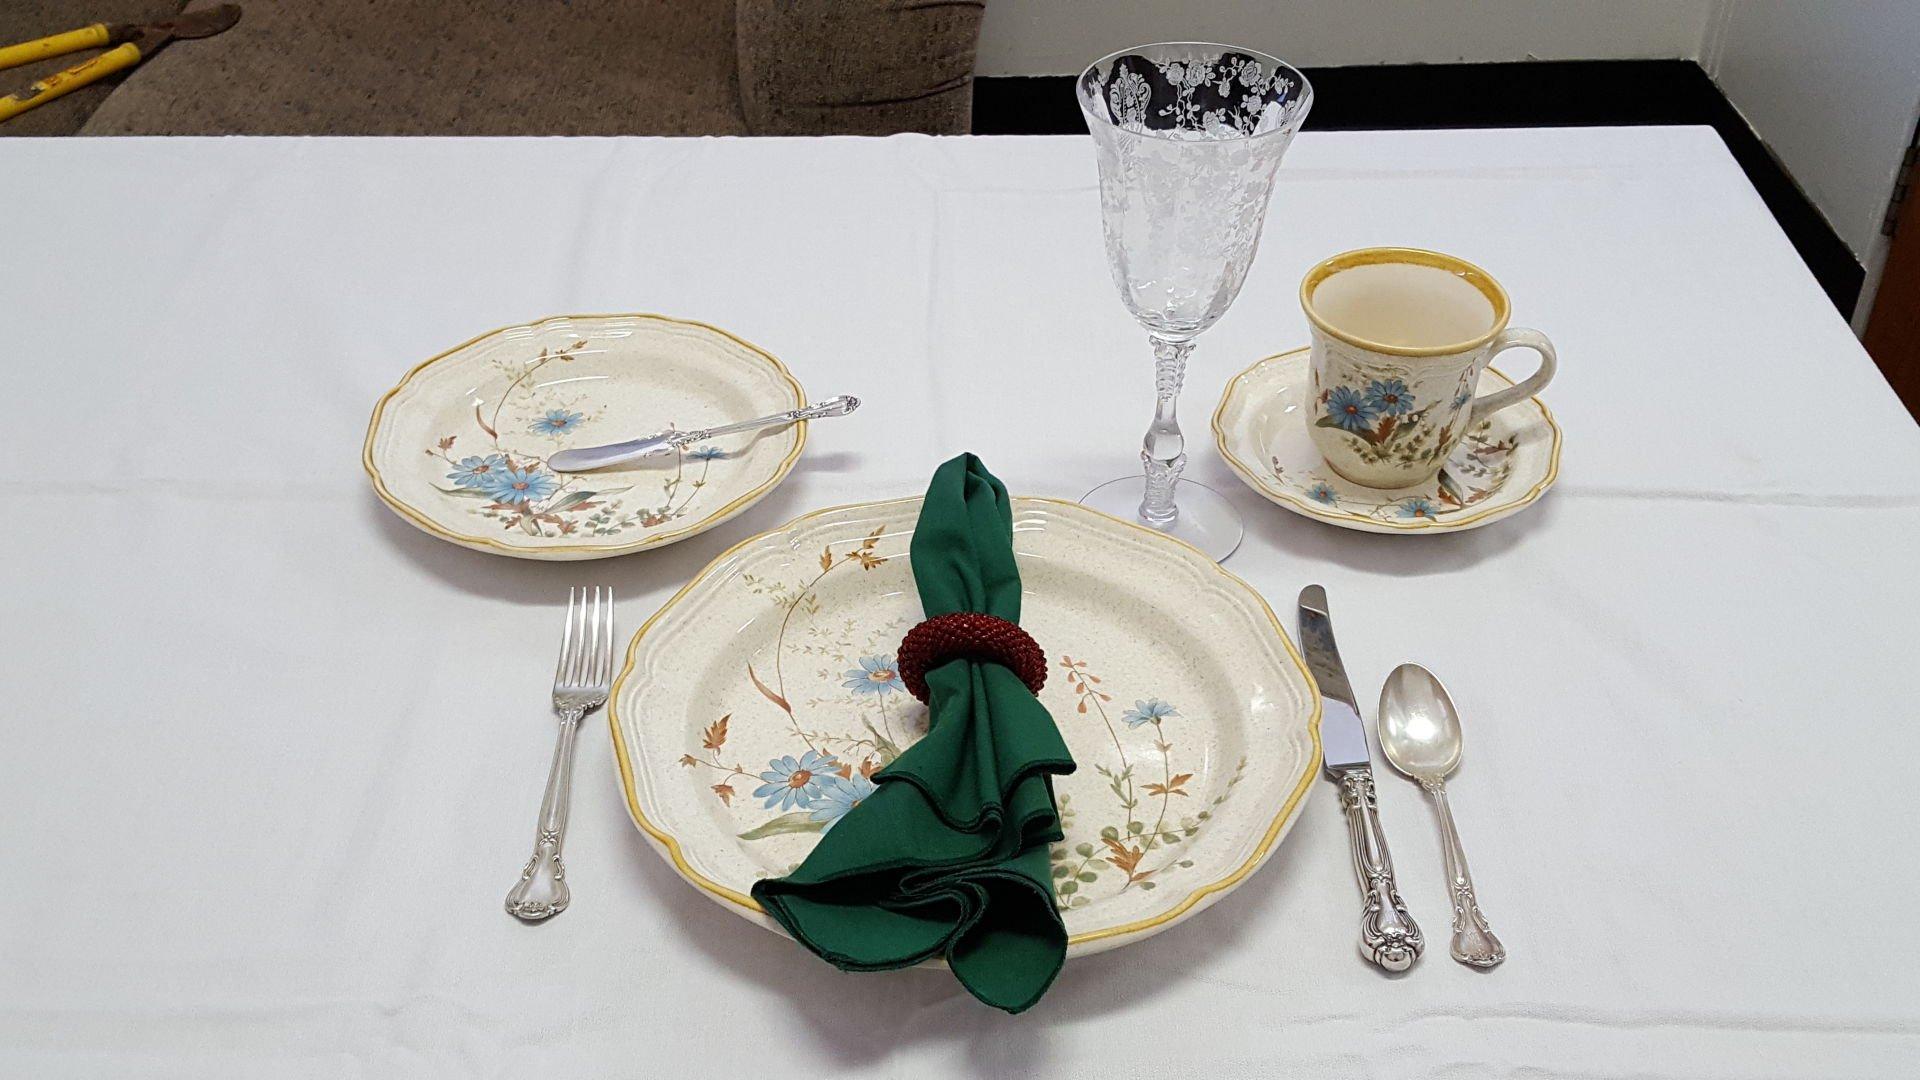 & A basic family-dinner table setting | | tucson.com